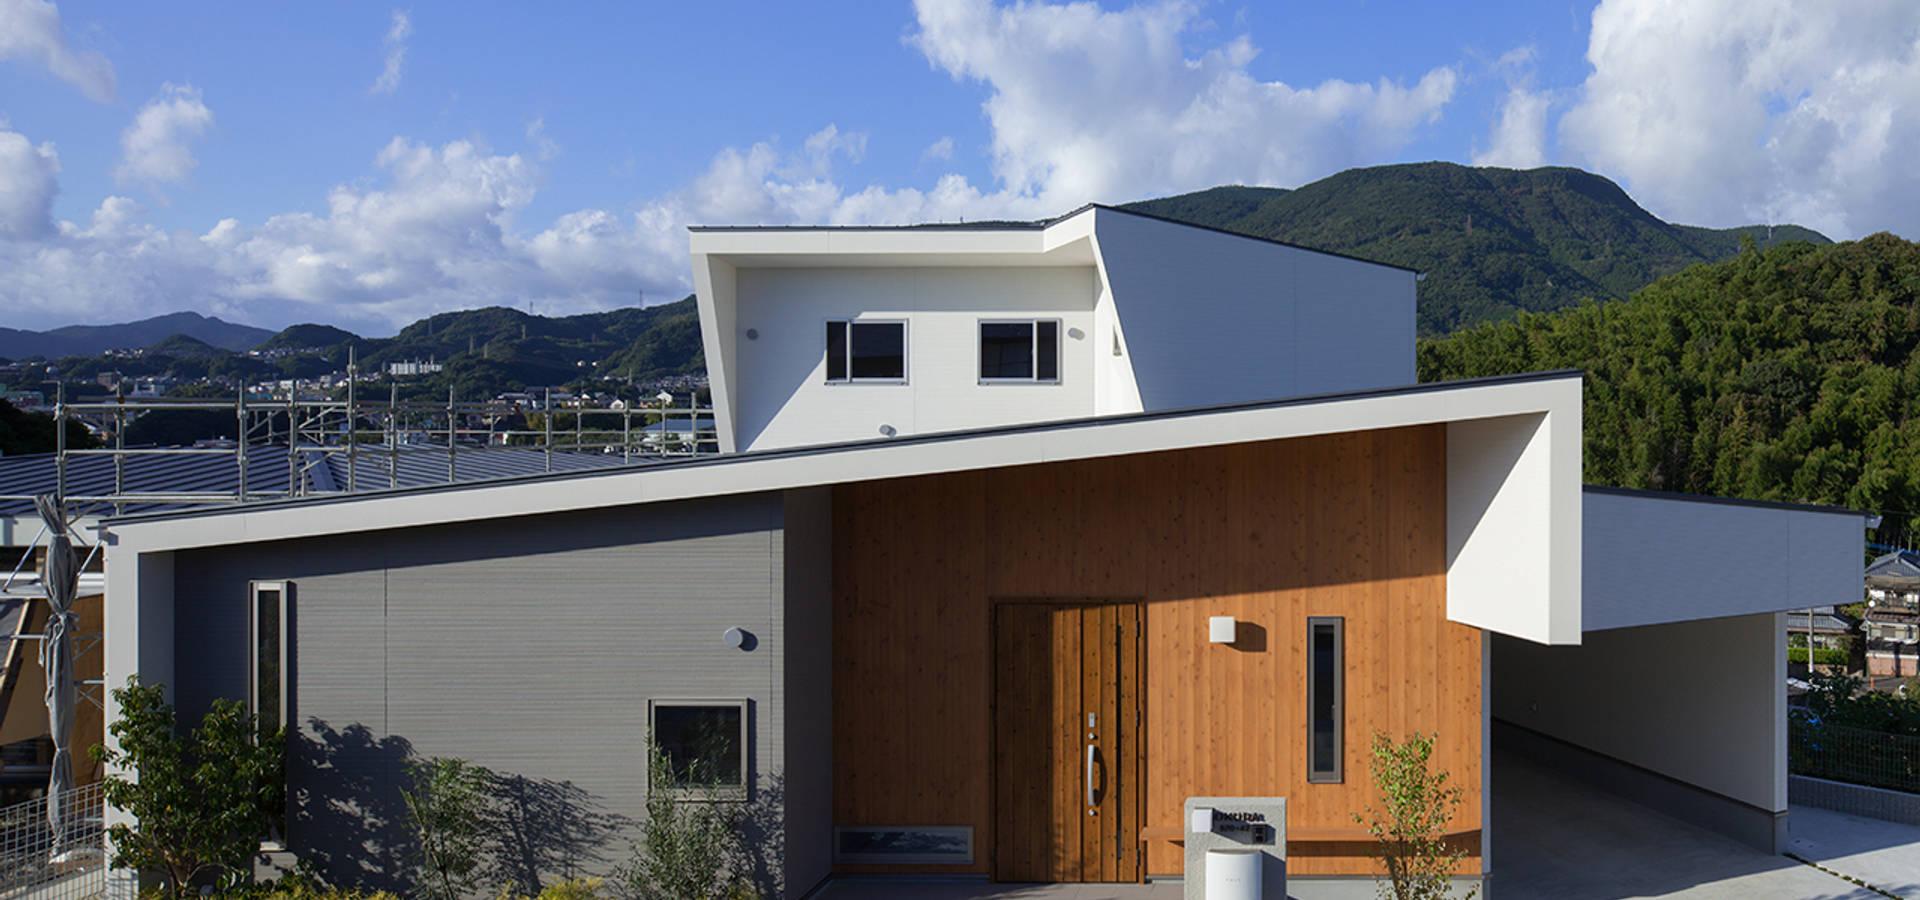 J.HOUSE ARCHITECT AND ASSOCIATES